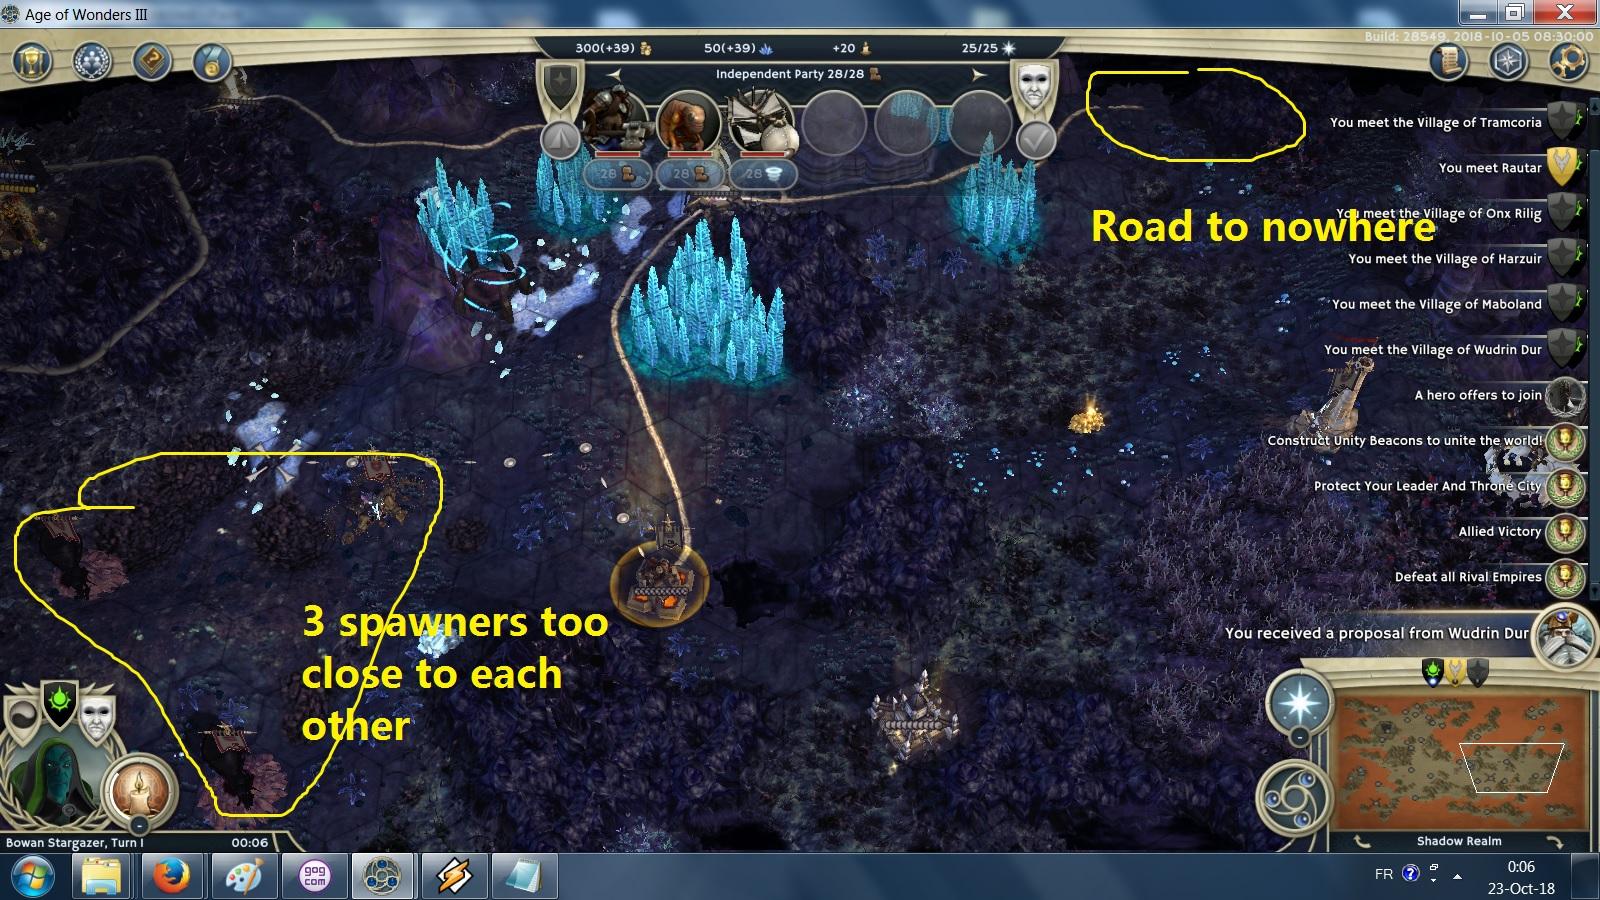 154024671220181022_SR-RMG_spawner-and-road-issues.jpg